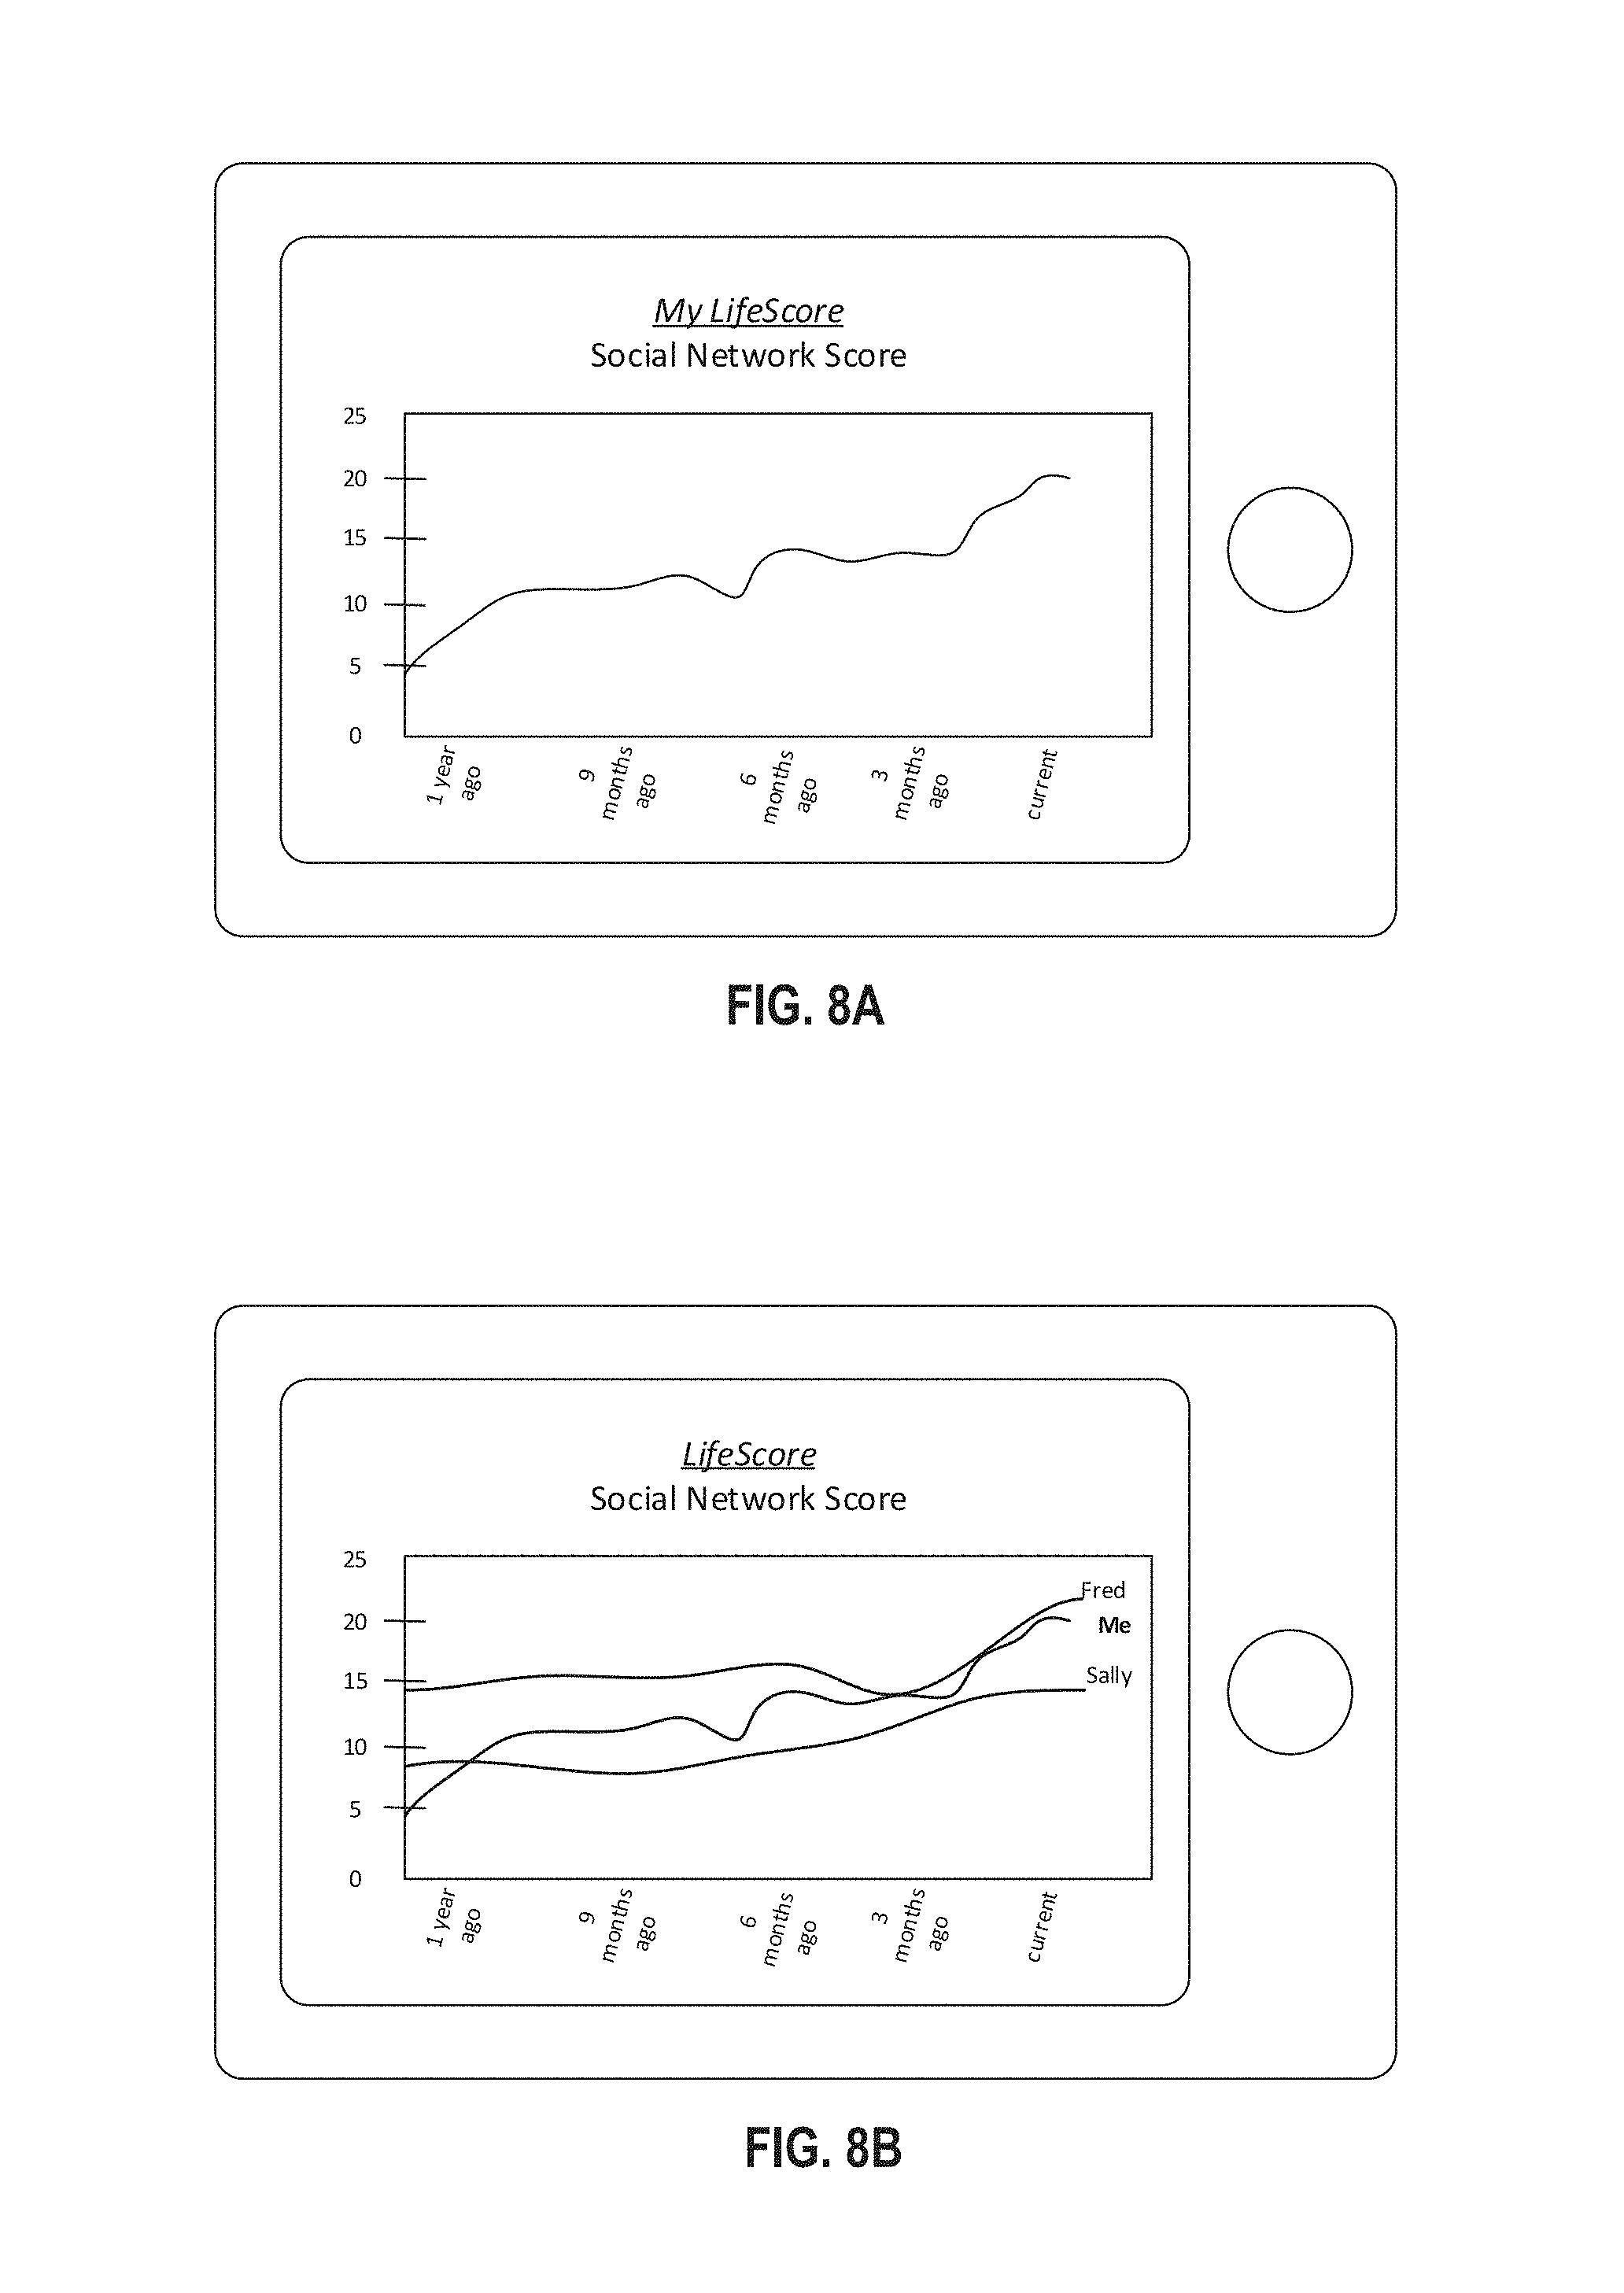 Patent US 10,176,233 B1